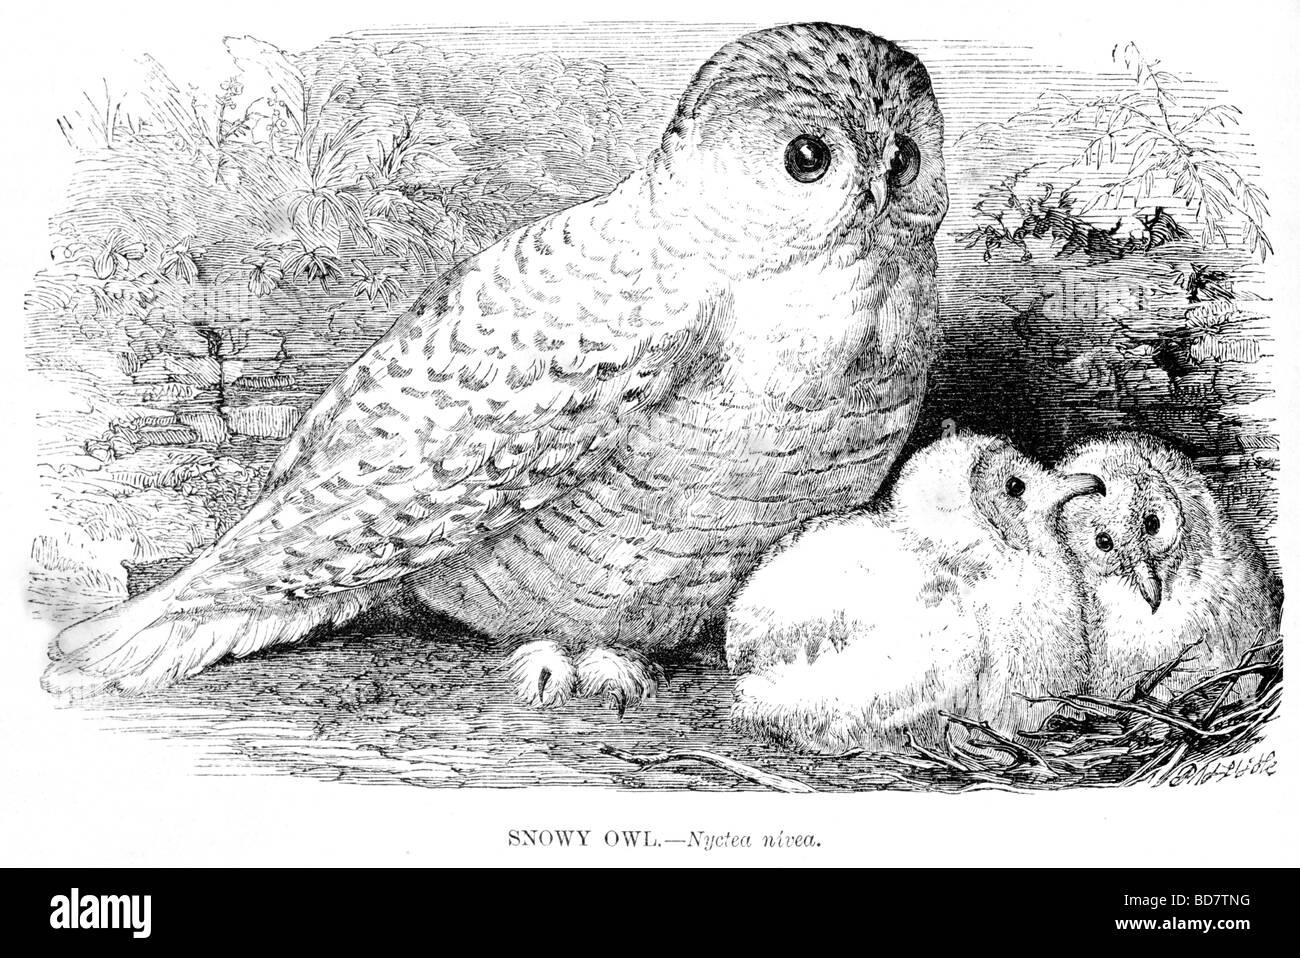 snowy owl nyctea nivea bird of prey - Stock Image